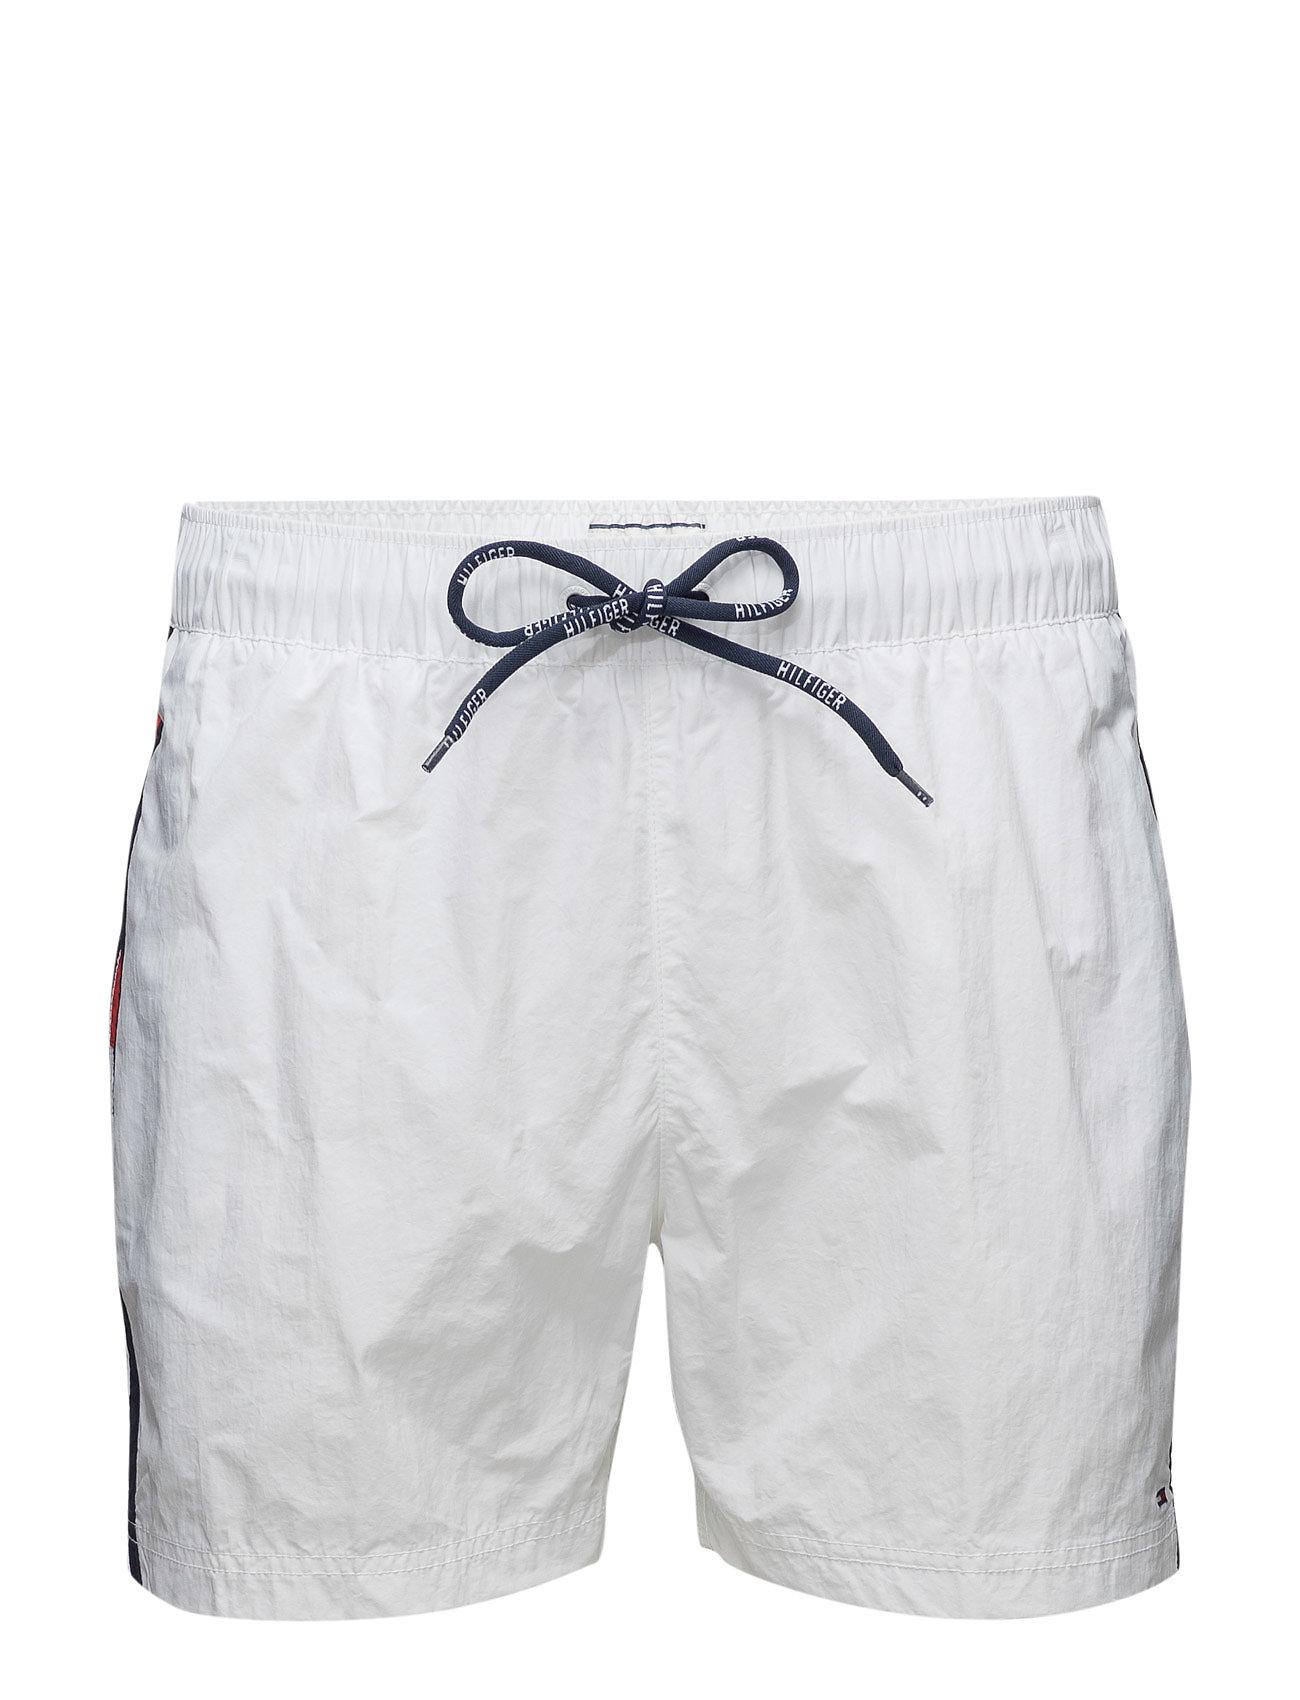 Thdm Basic Flag Swimshort 12 Hilfiger Denim Shorts til Herrer i hvid